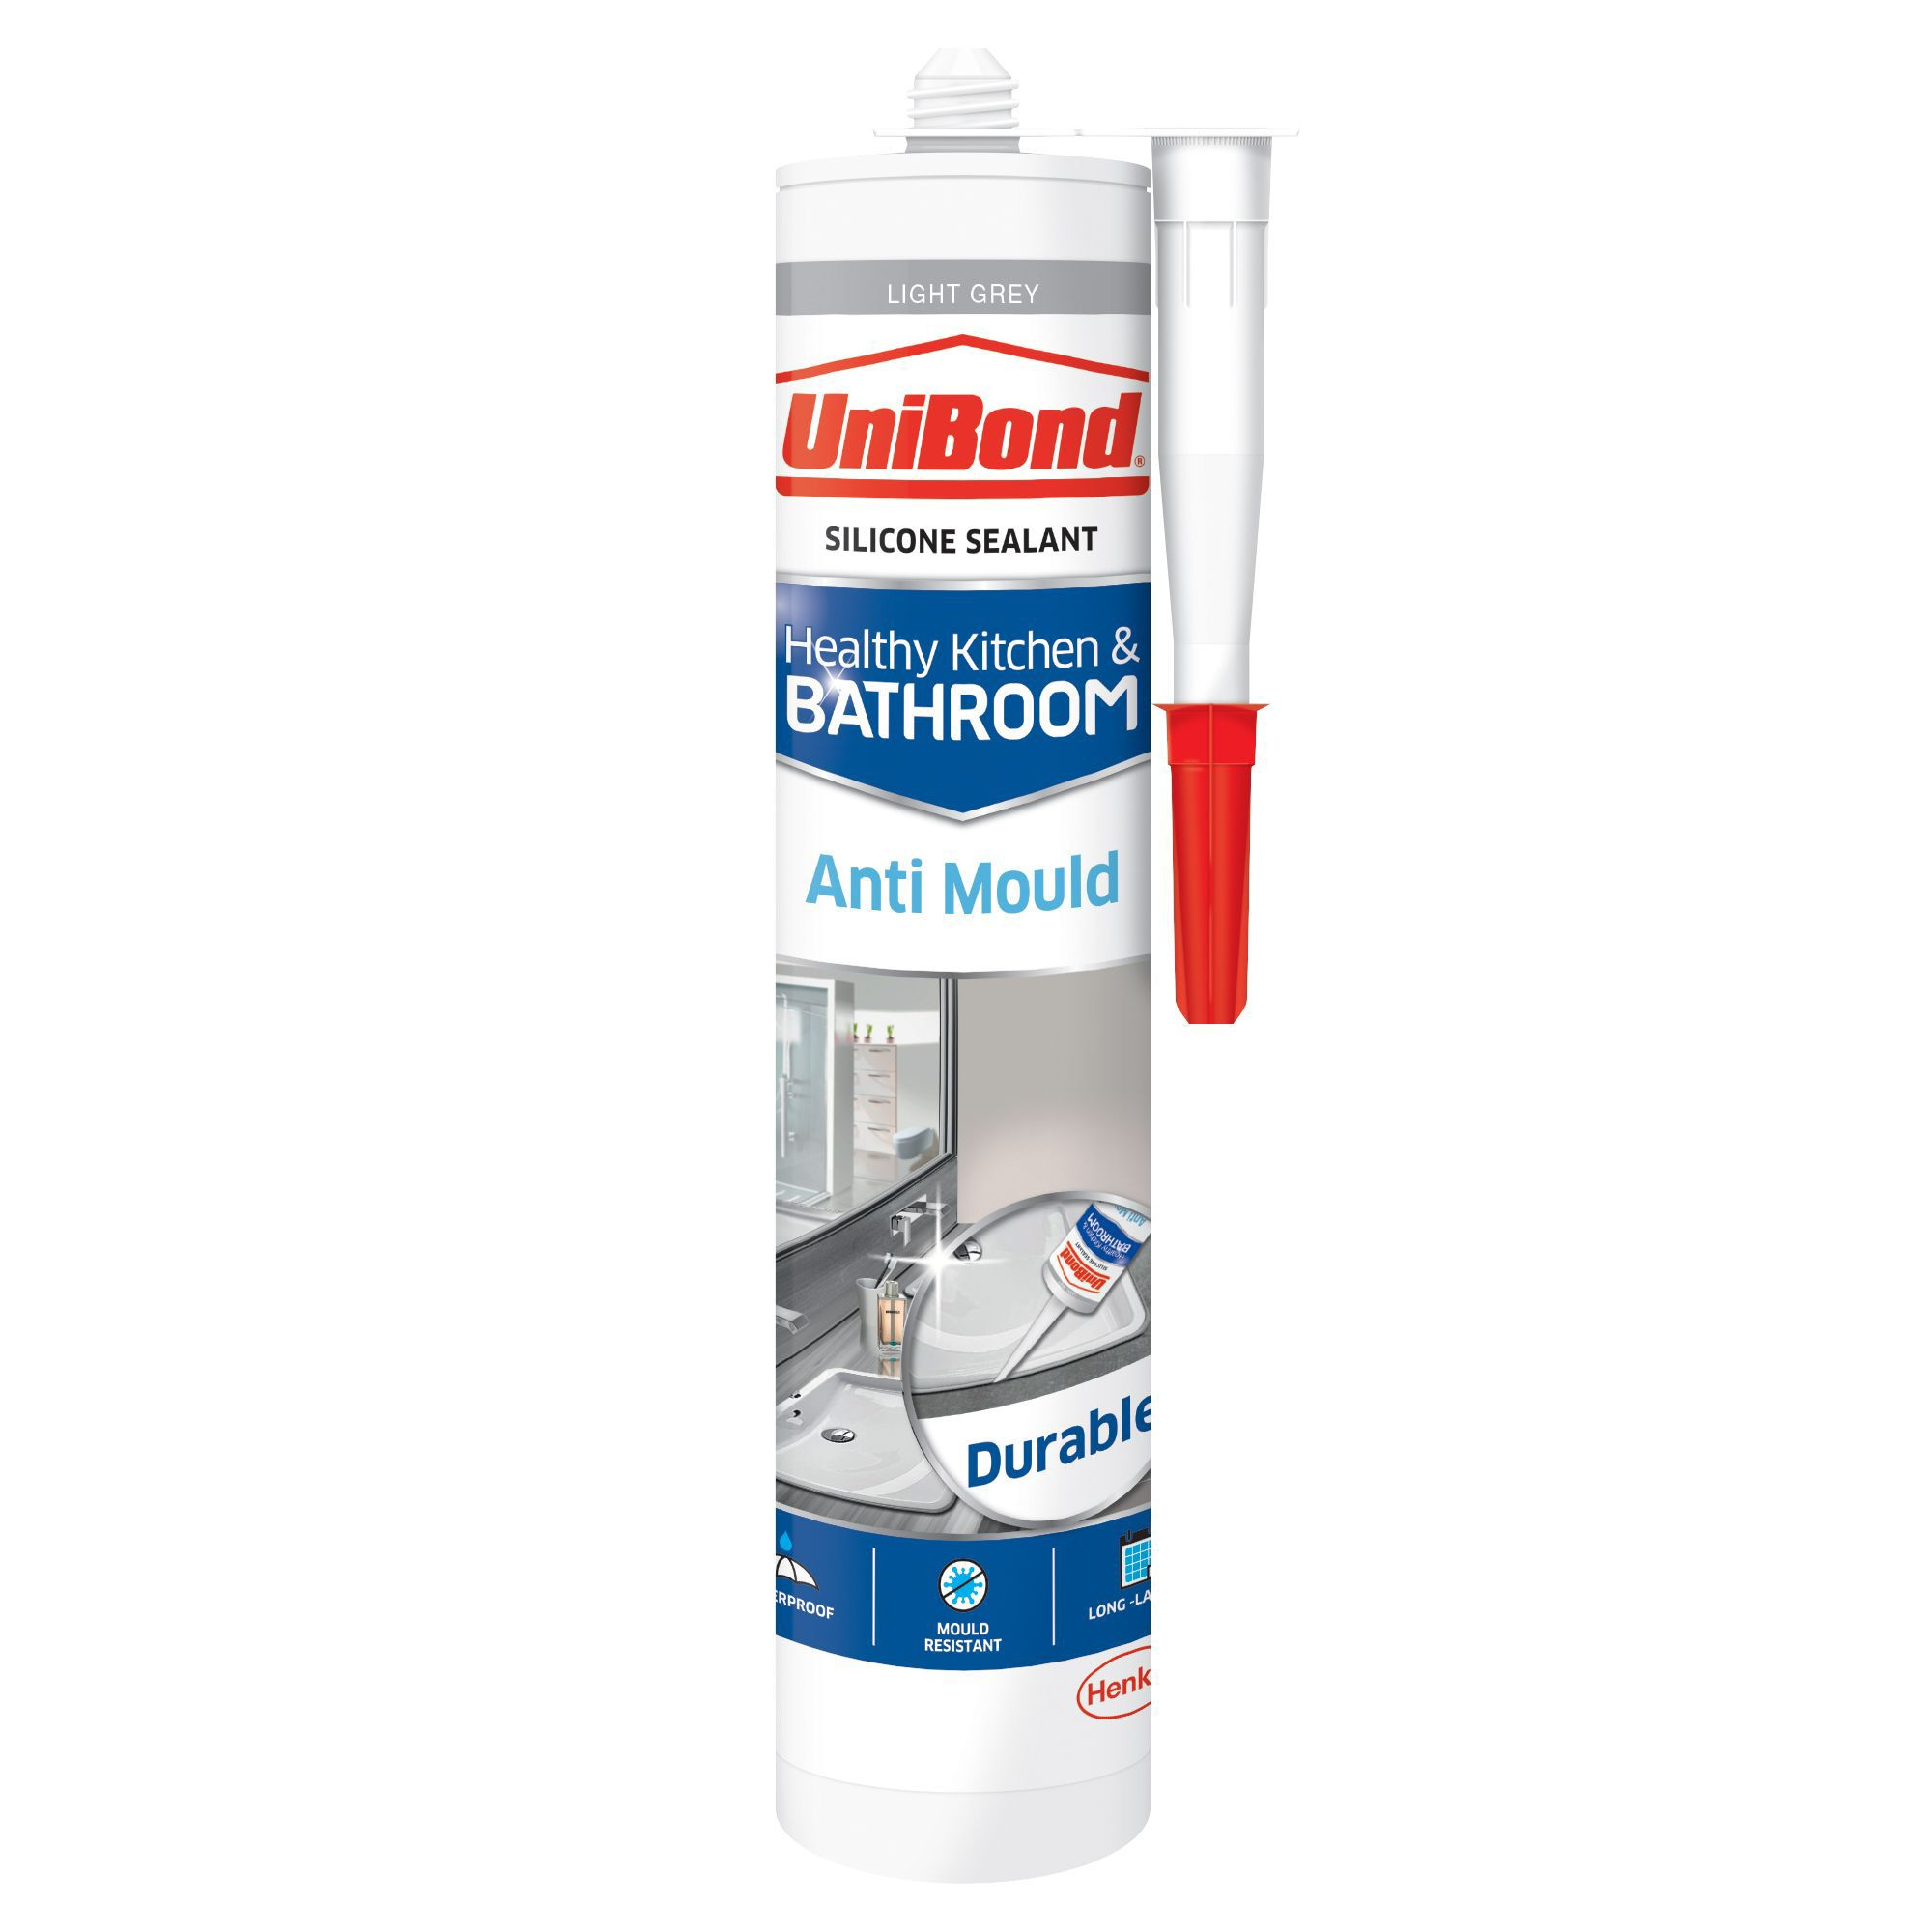 Unibond Anti Mould Light Grey Kitchen Amp Bathroom Sealant